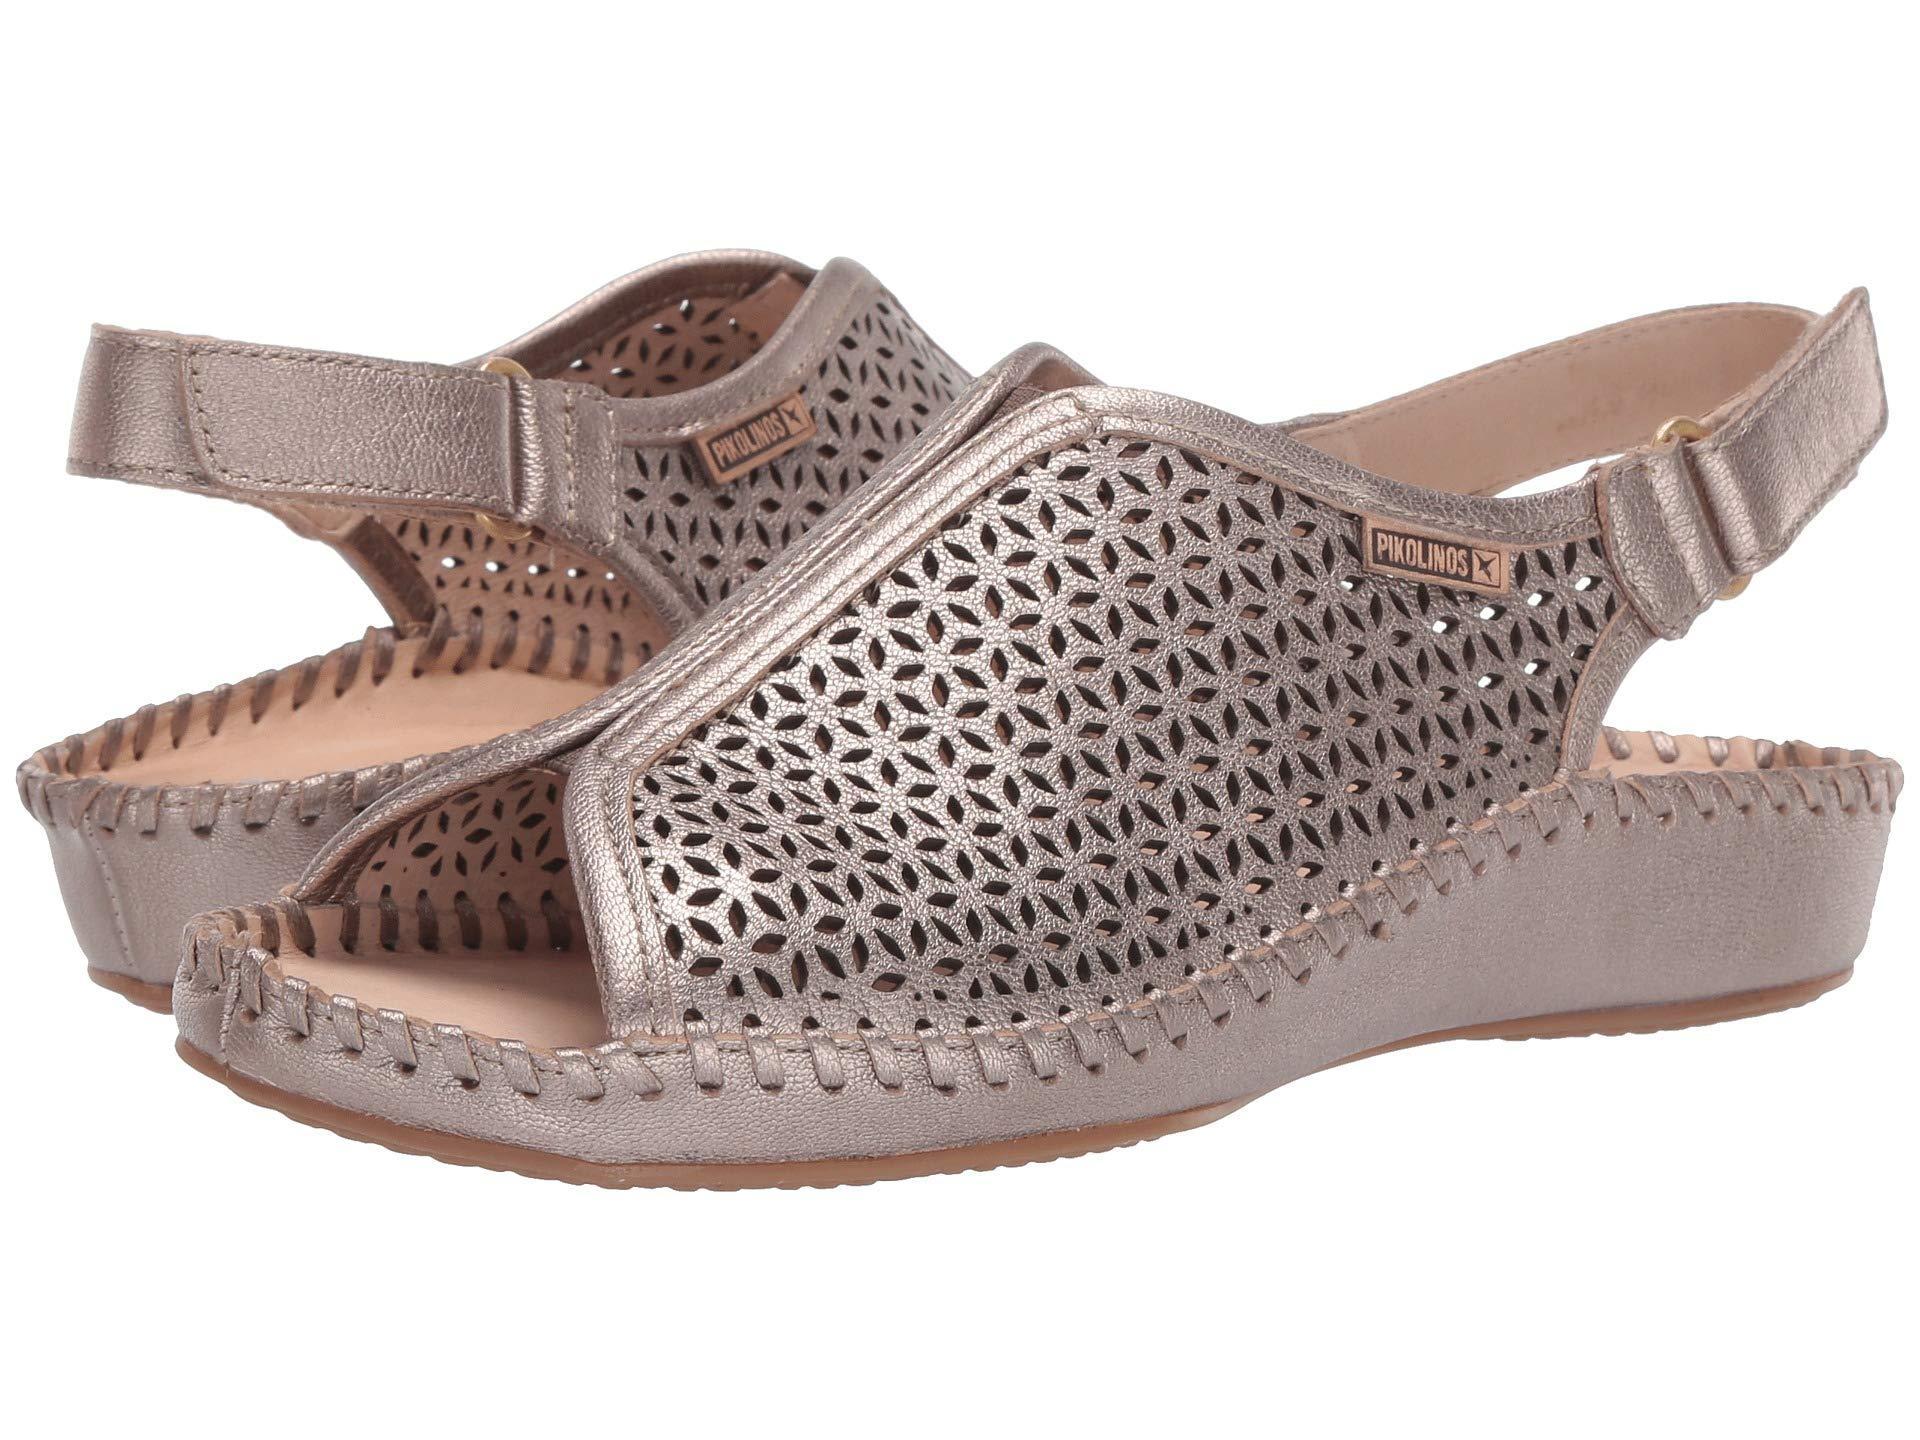 2b8a19b90 Lyst - Pikolinos P. Vallarta 655-0720cl (stone) Women's Shoes